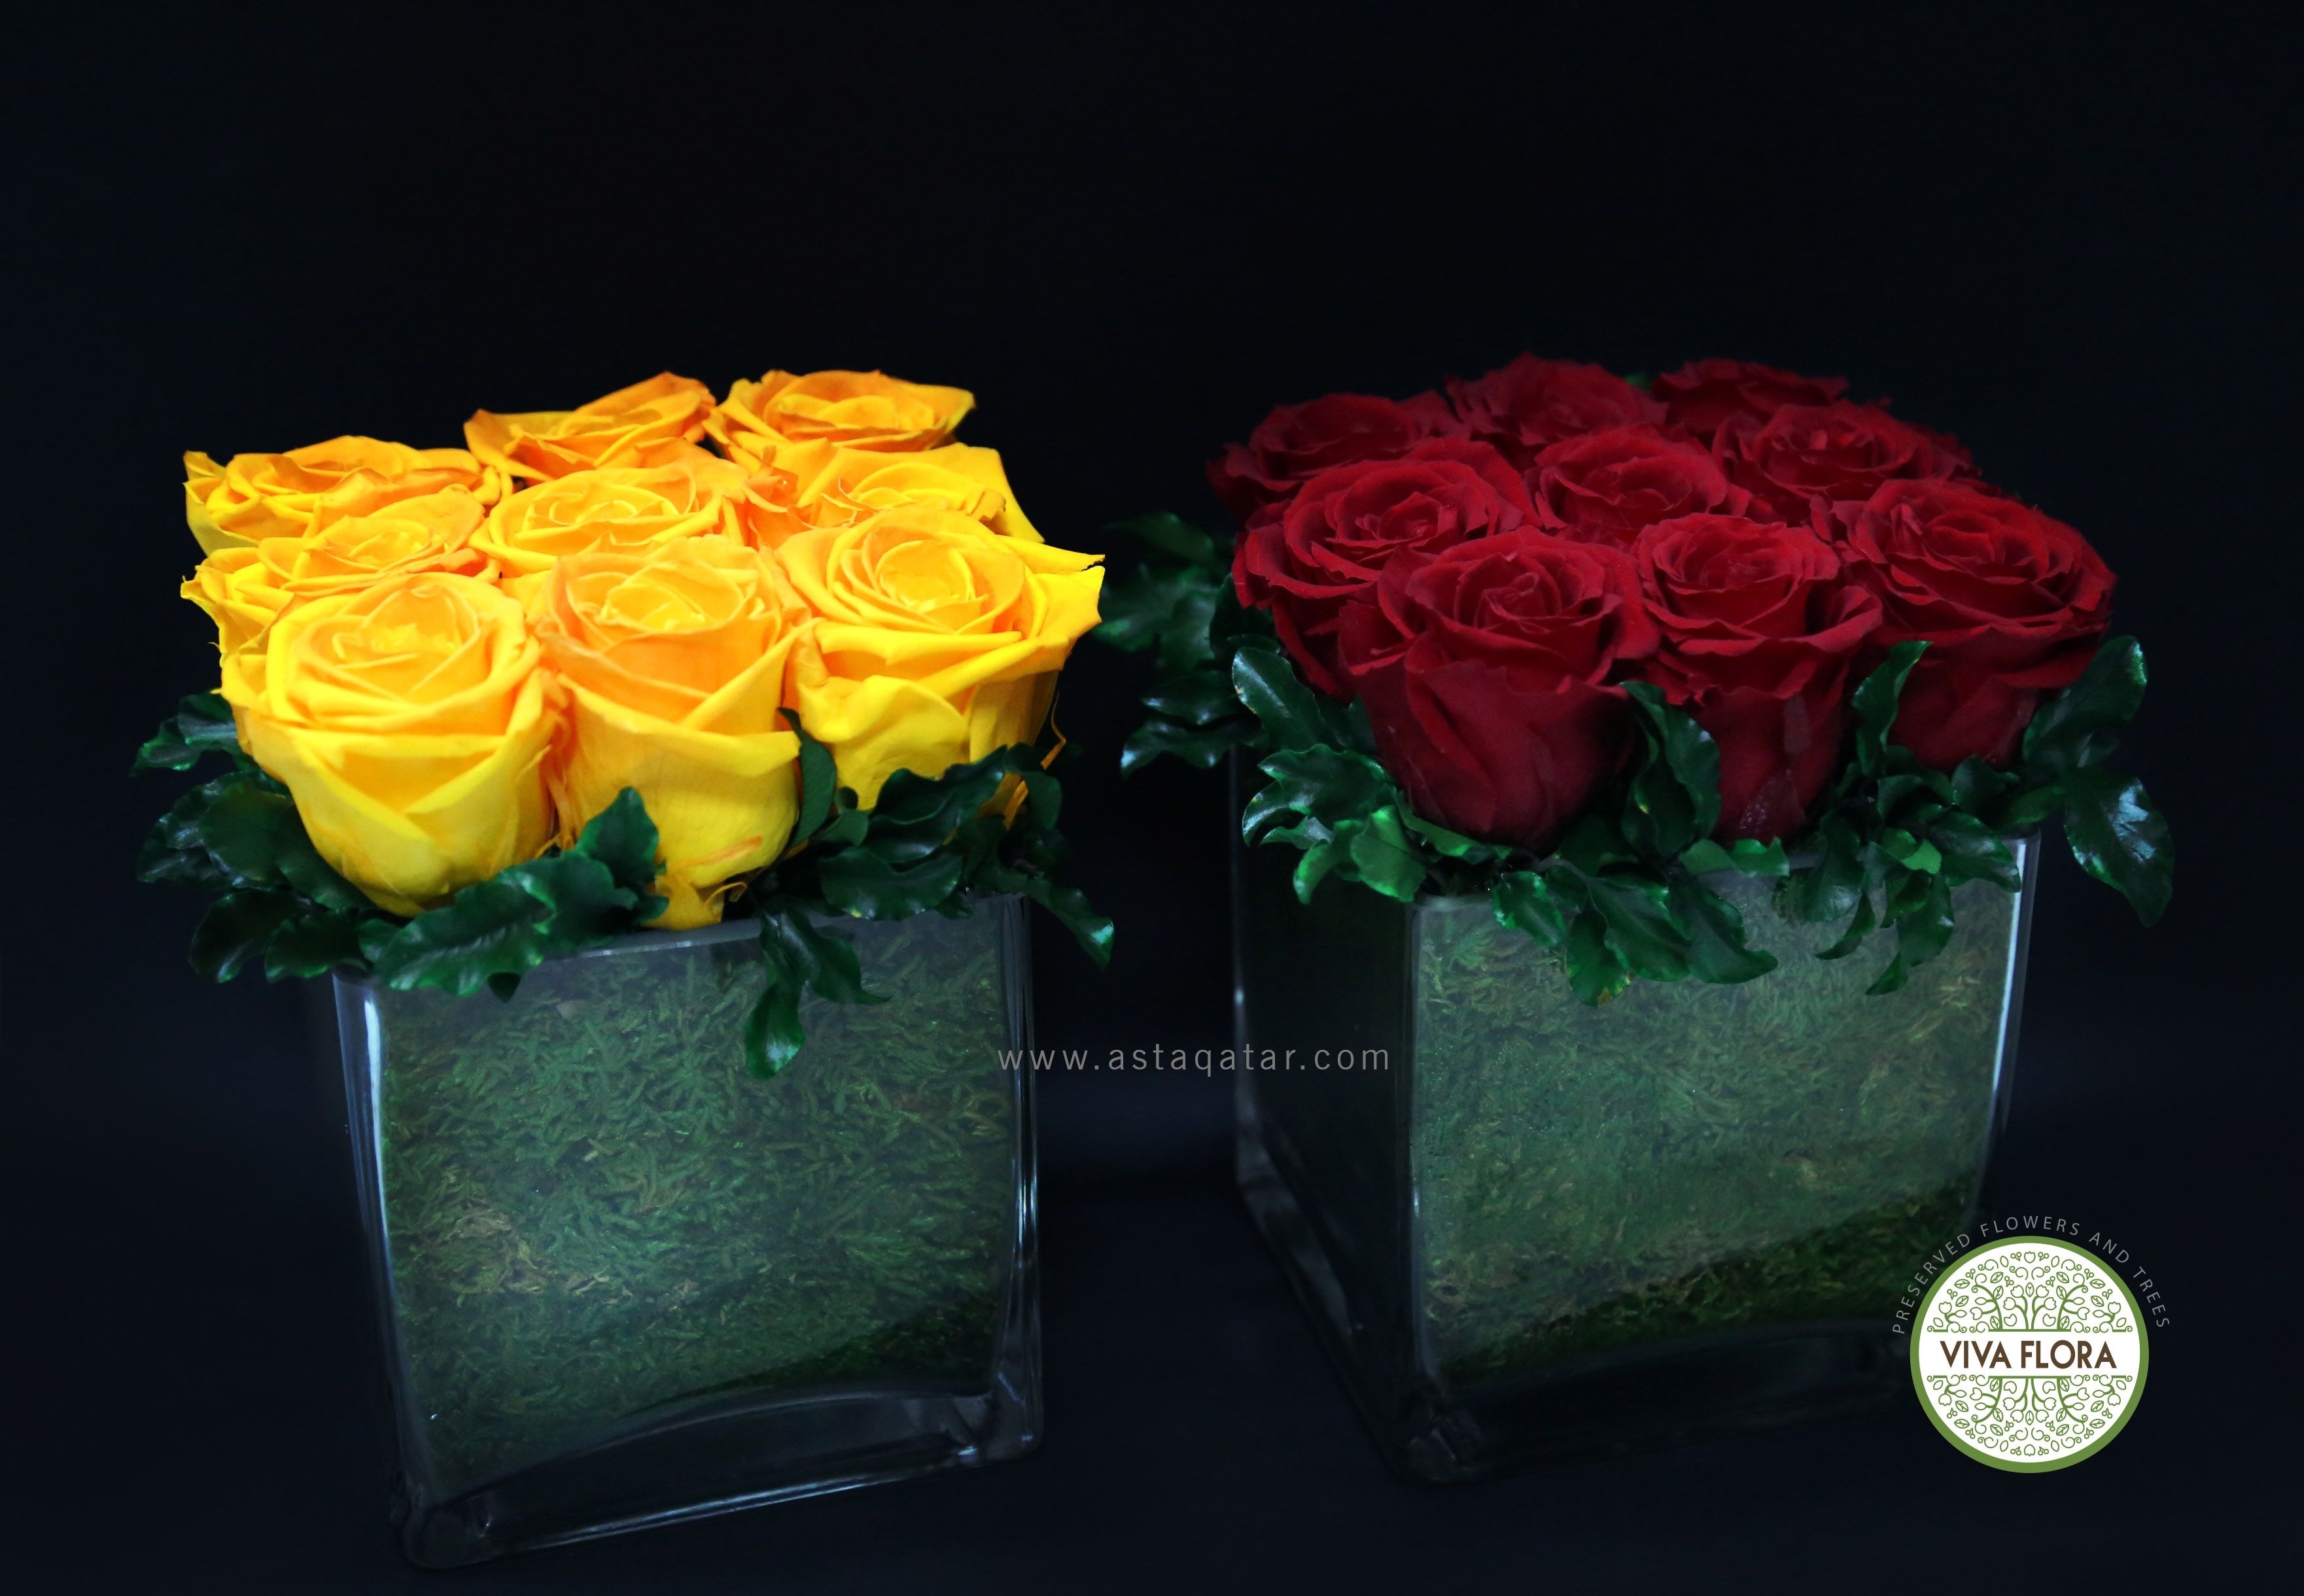 Preserved Flower Arrangements From Viva Flora Doha Qatar How To Preserve Flowers Green Wall Flower Arrangements